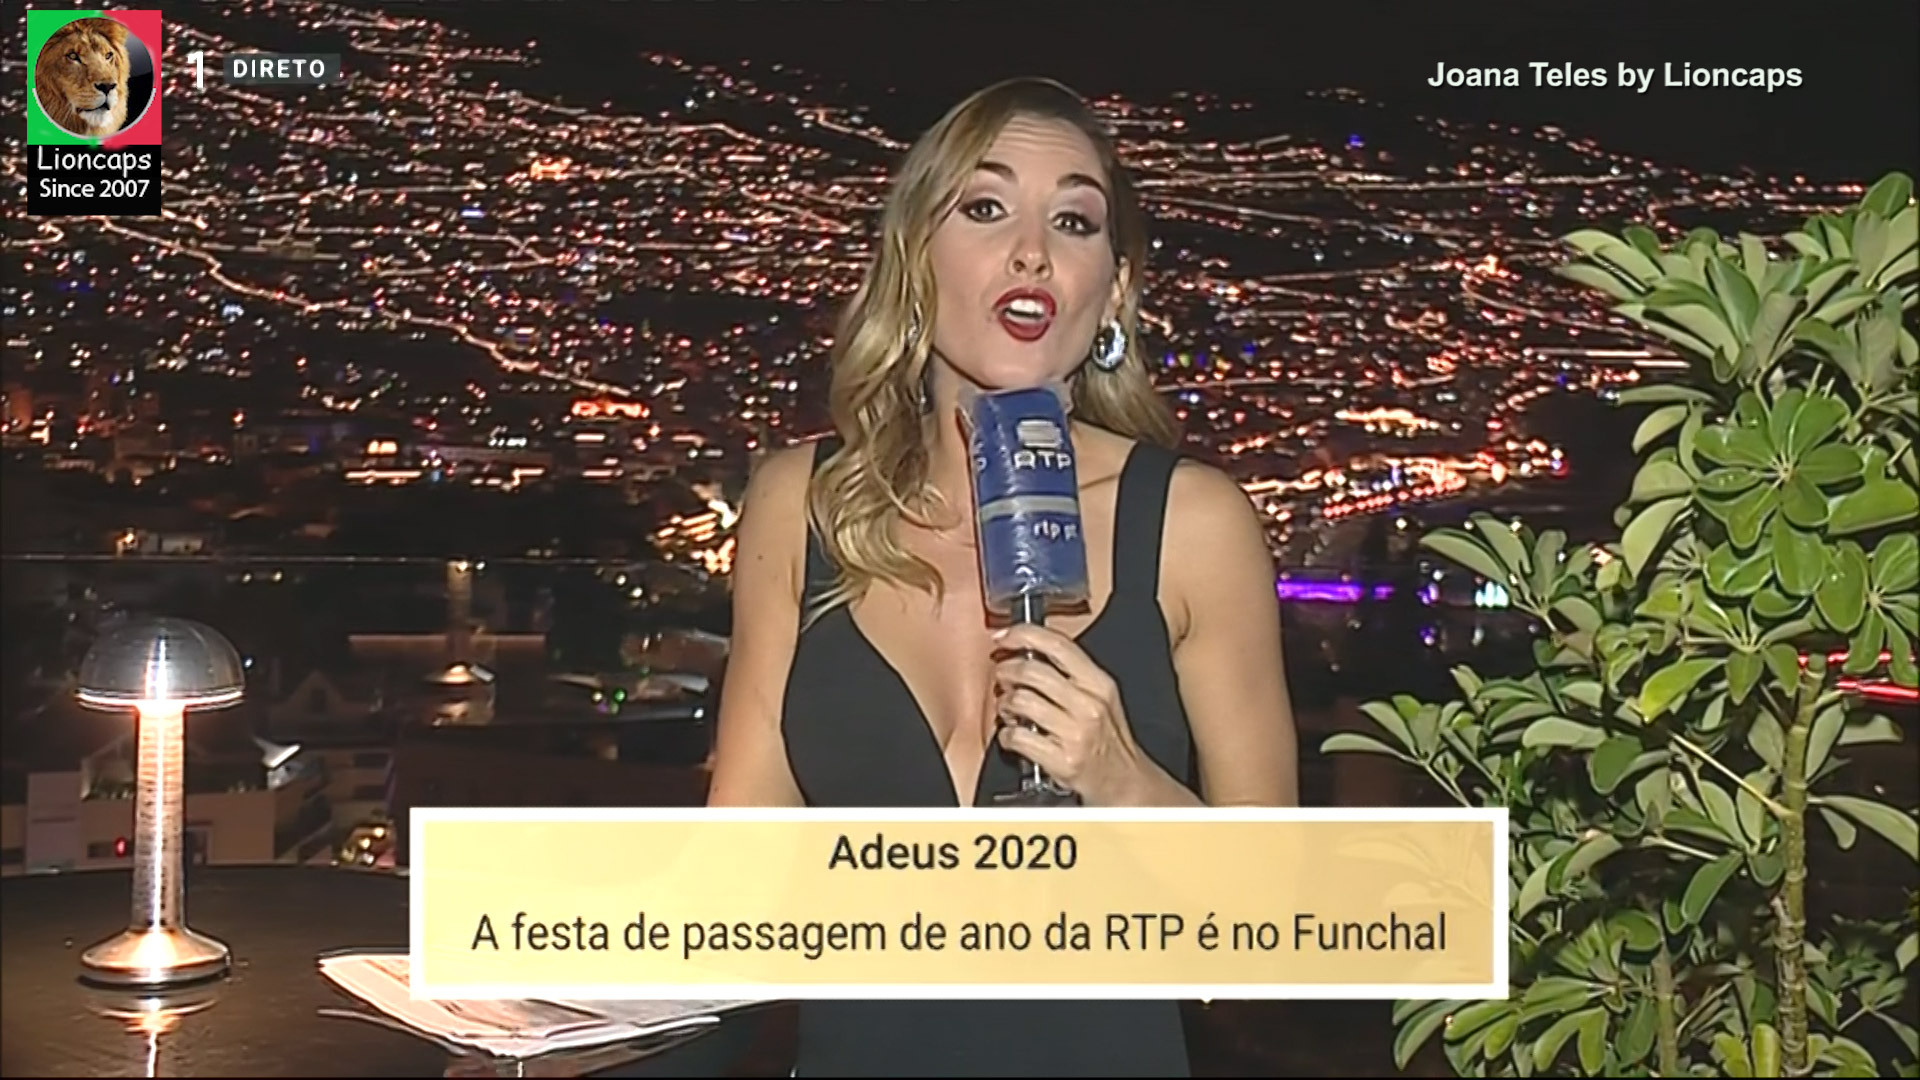 joana_teles_rtp_lioncaps_19_06_2021 (14).jpg